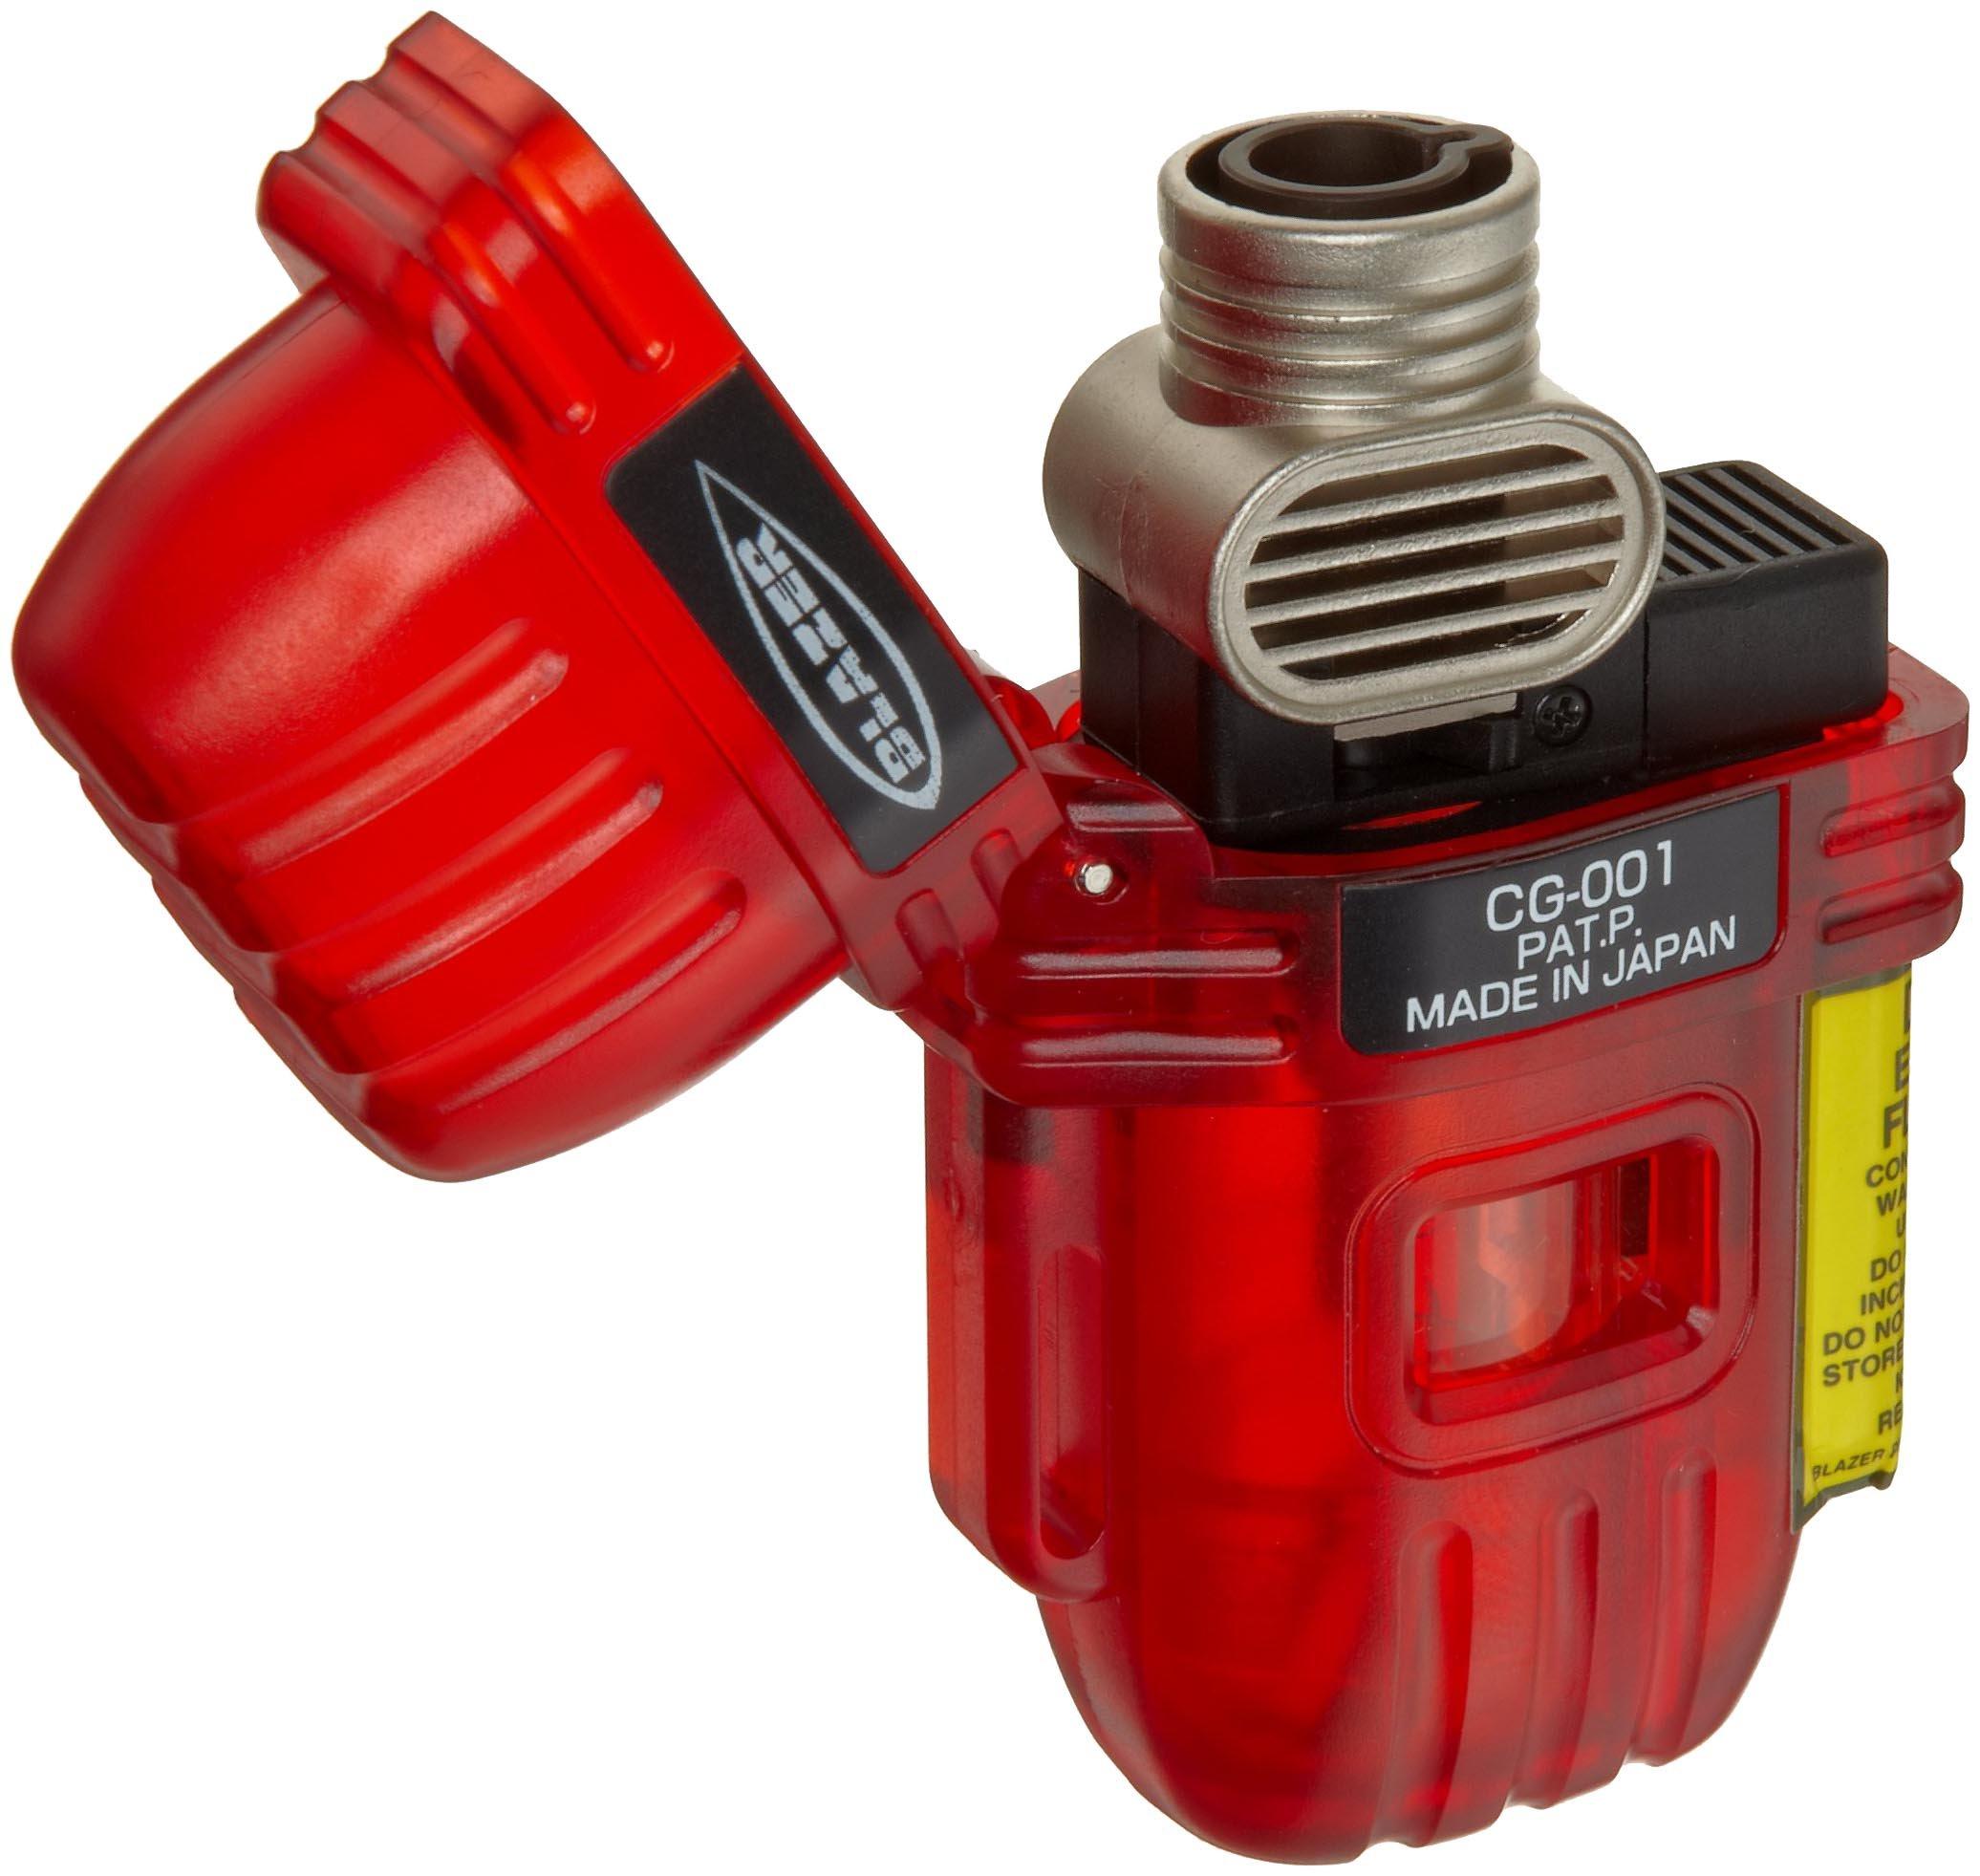 Blazer CG-001 Butane Refillable  Torch Lighter, Red